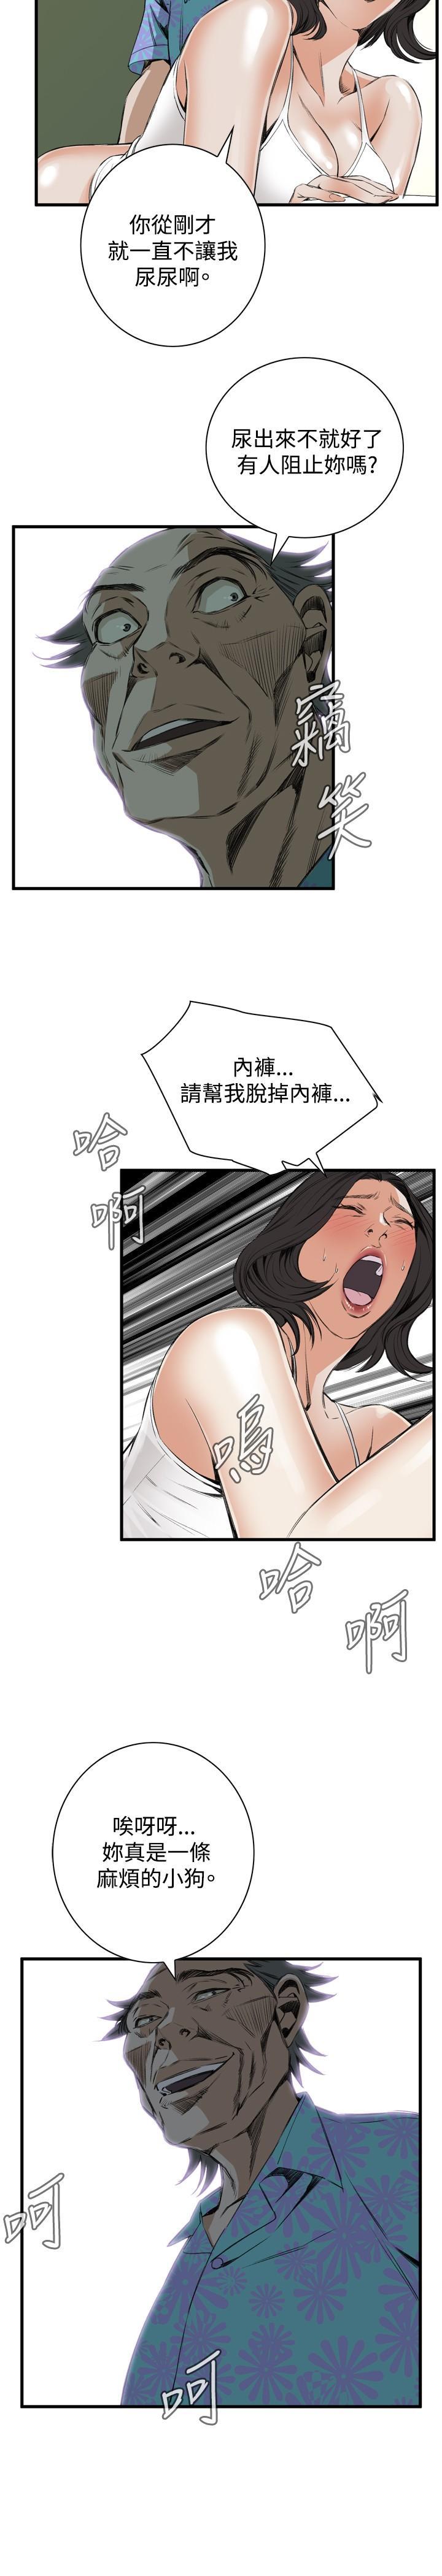 Take a Peek 偷窥 Ch.39~60 [Chinese]中文 271